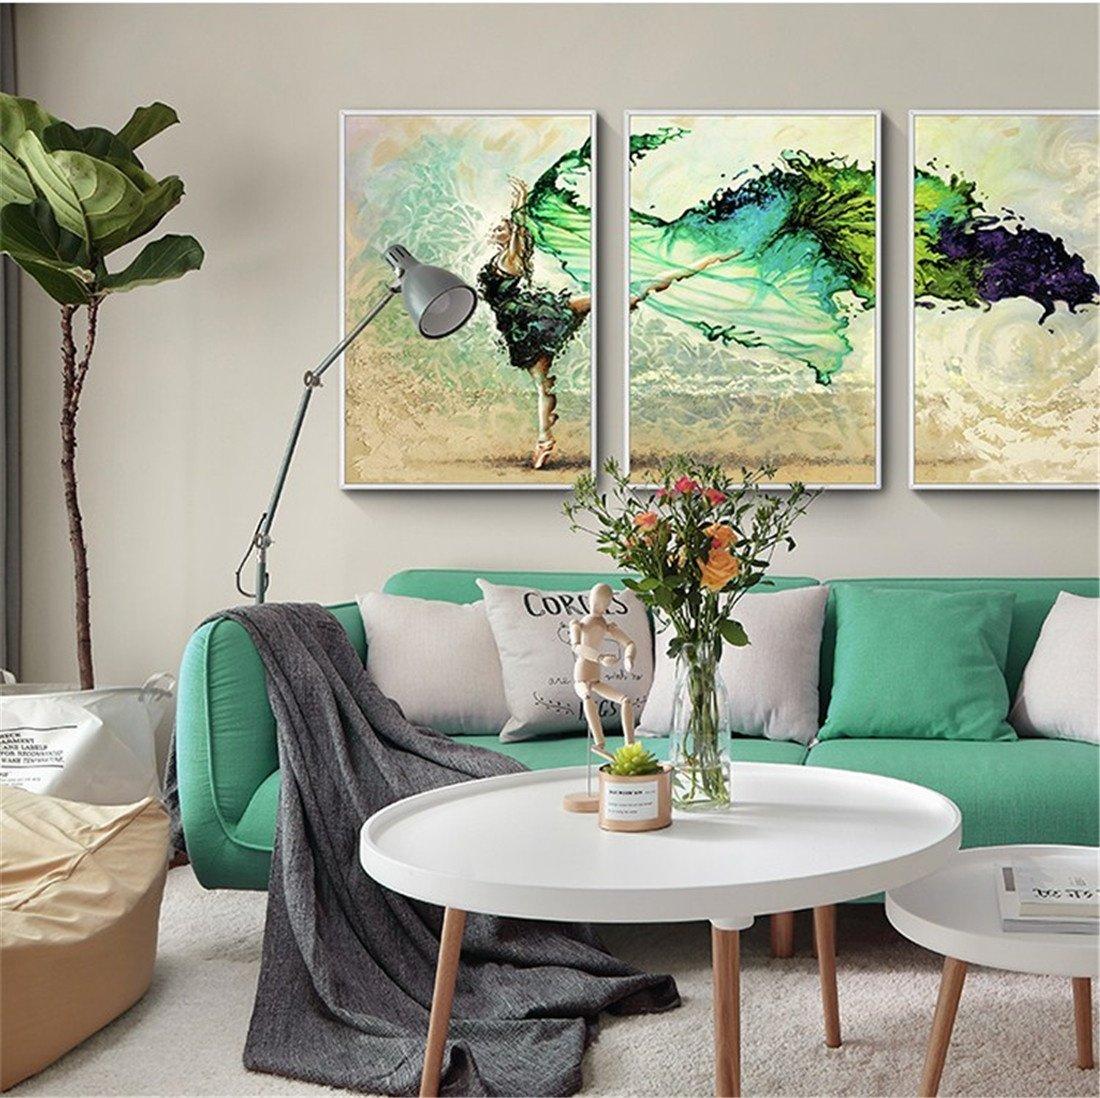 XIAPENGbailarina Sala de Estar Abstracta Pintura Decorativa sofá de Fondo Pintura de Pared Pintura de Pared Moderna nórdica Pintura Mural Simple cabecera 40  60 cm